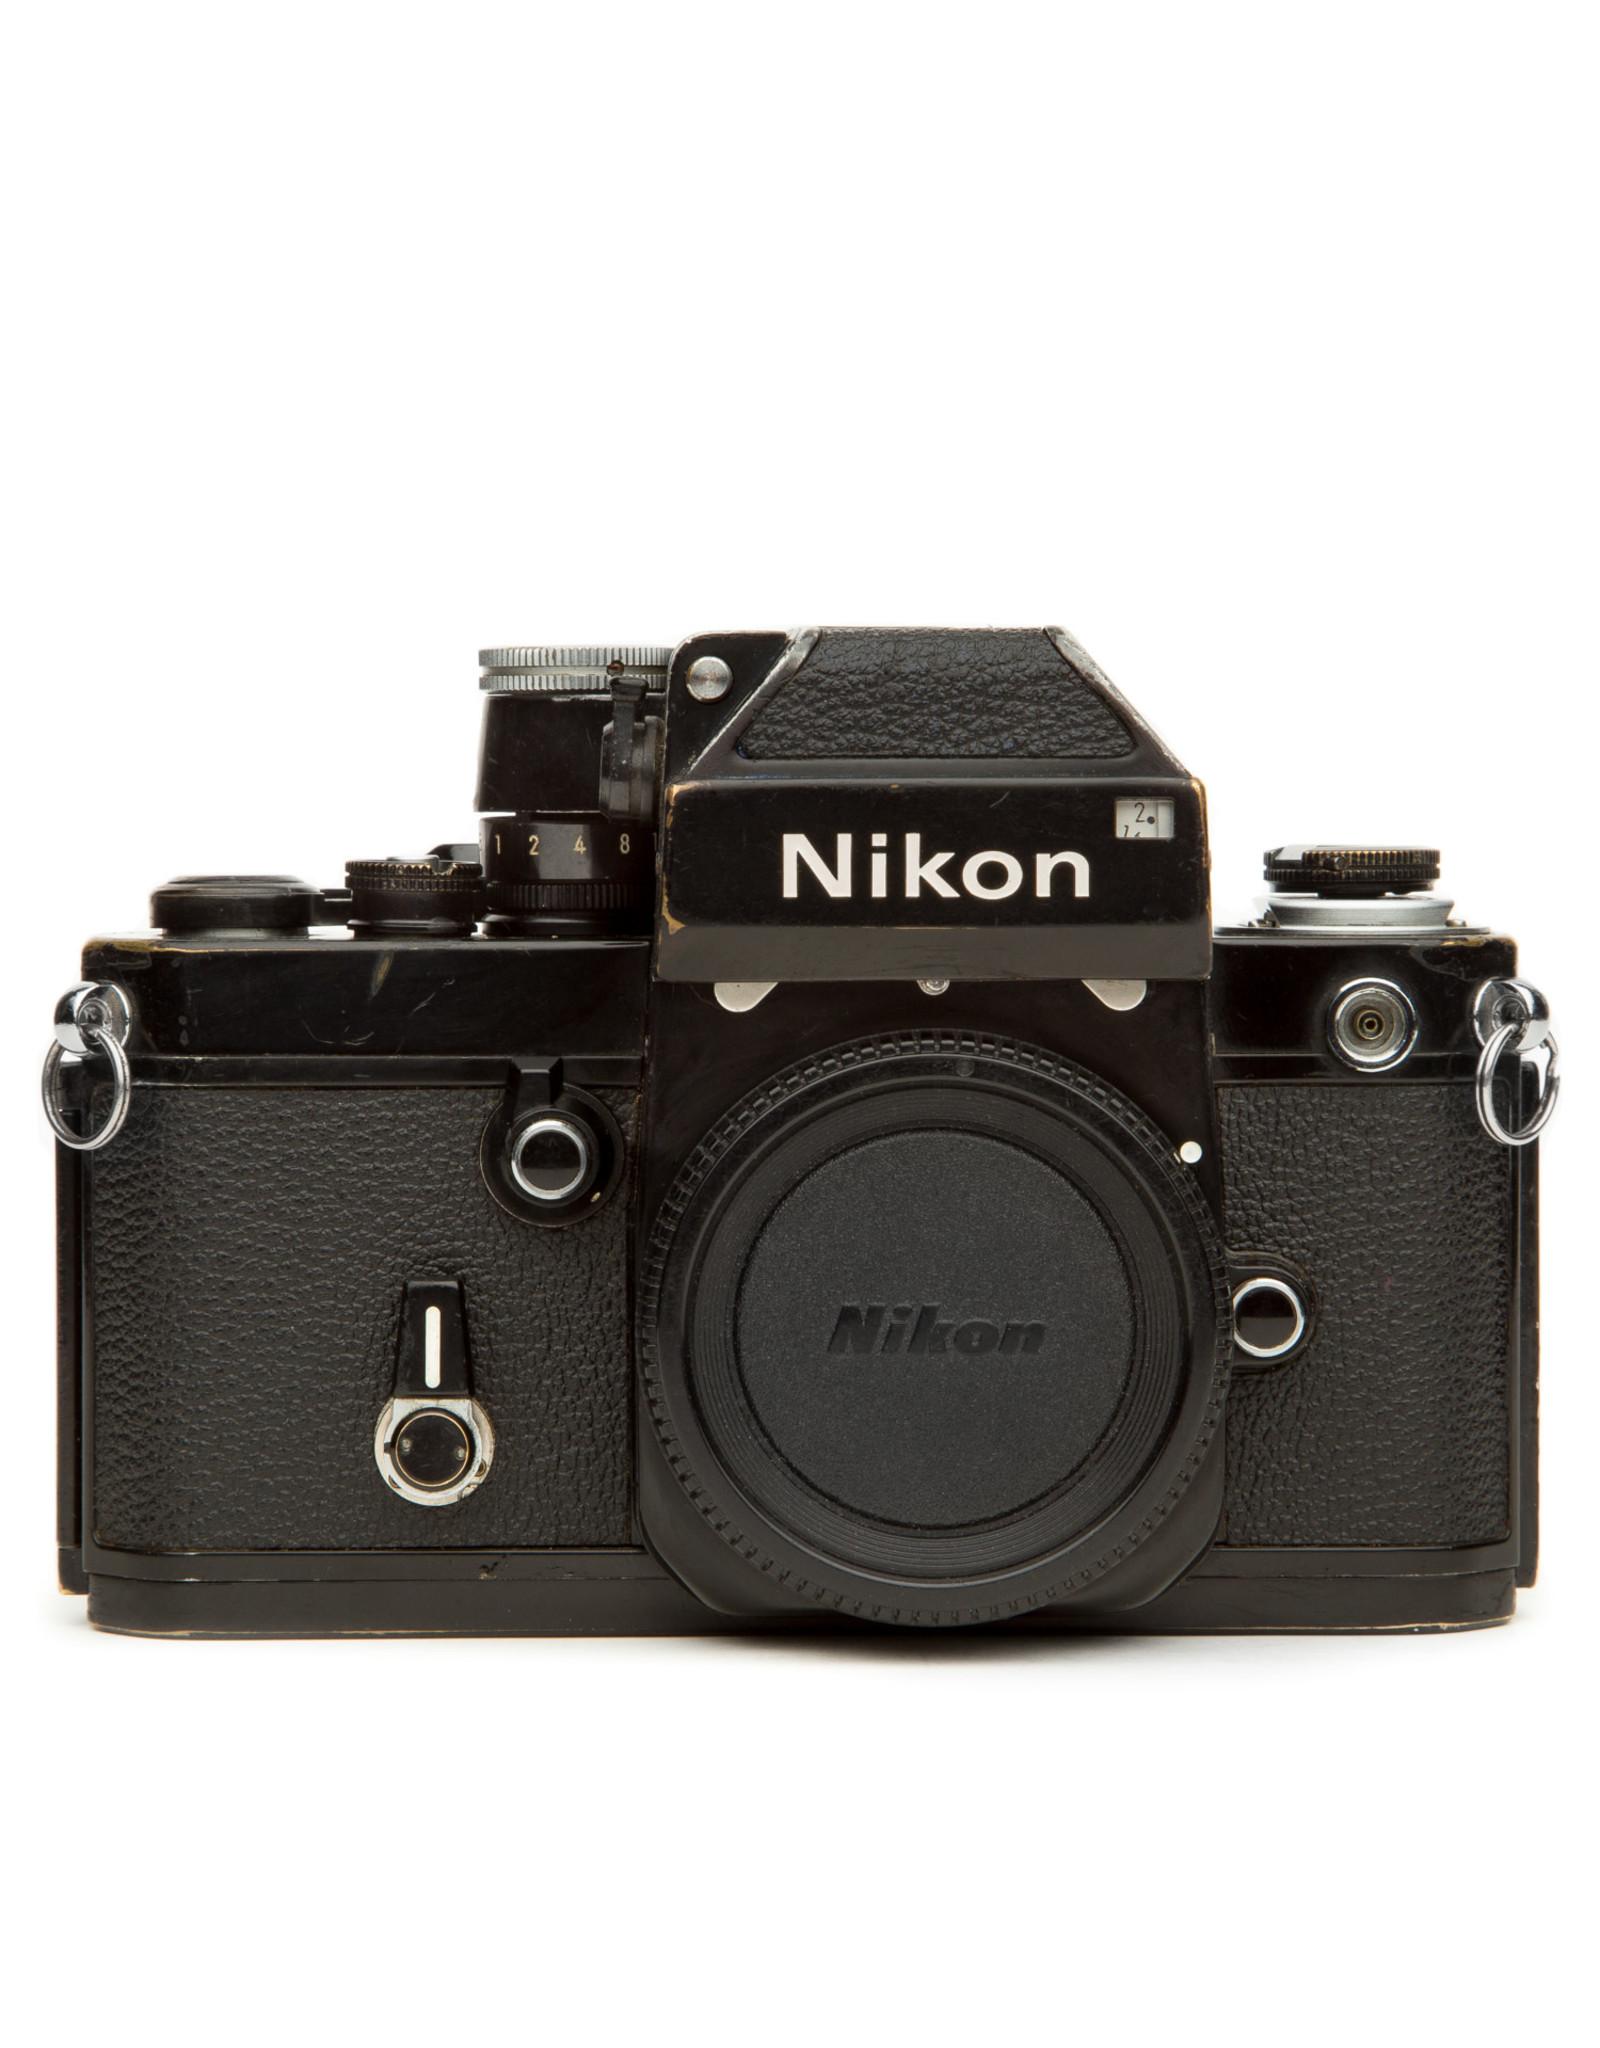 Nikon Nikon F2 Black 35mm SLR Camera